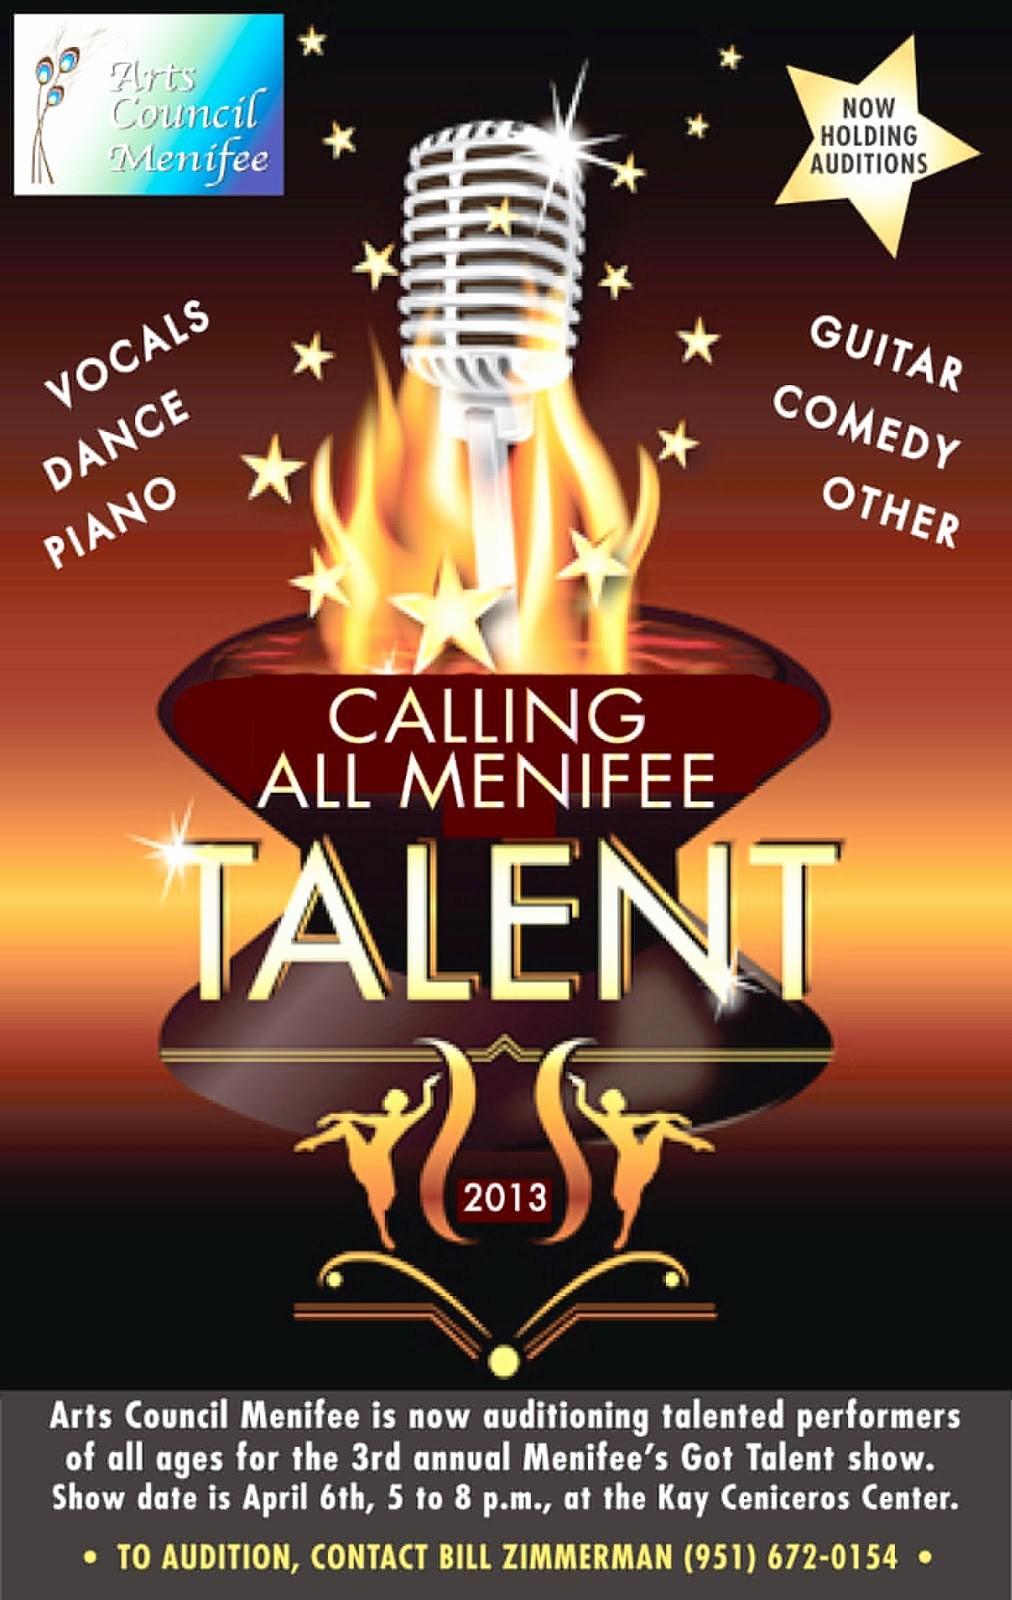 Free Talent Show Flyer Template Fresh Talent Show Flyer Design – Worptir